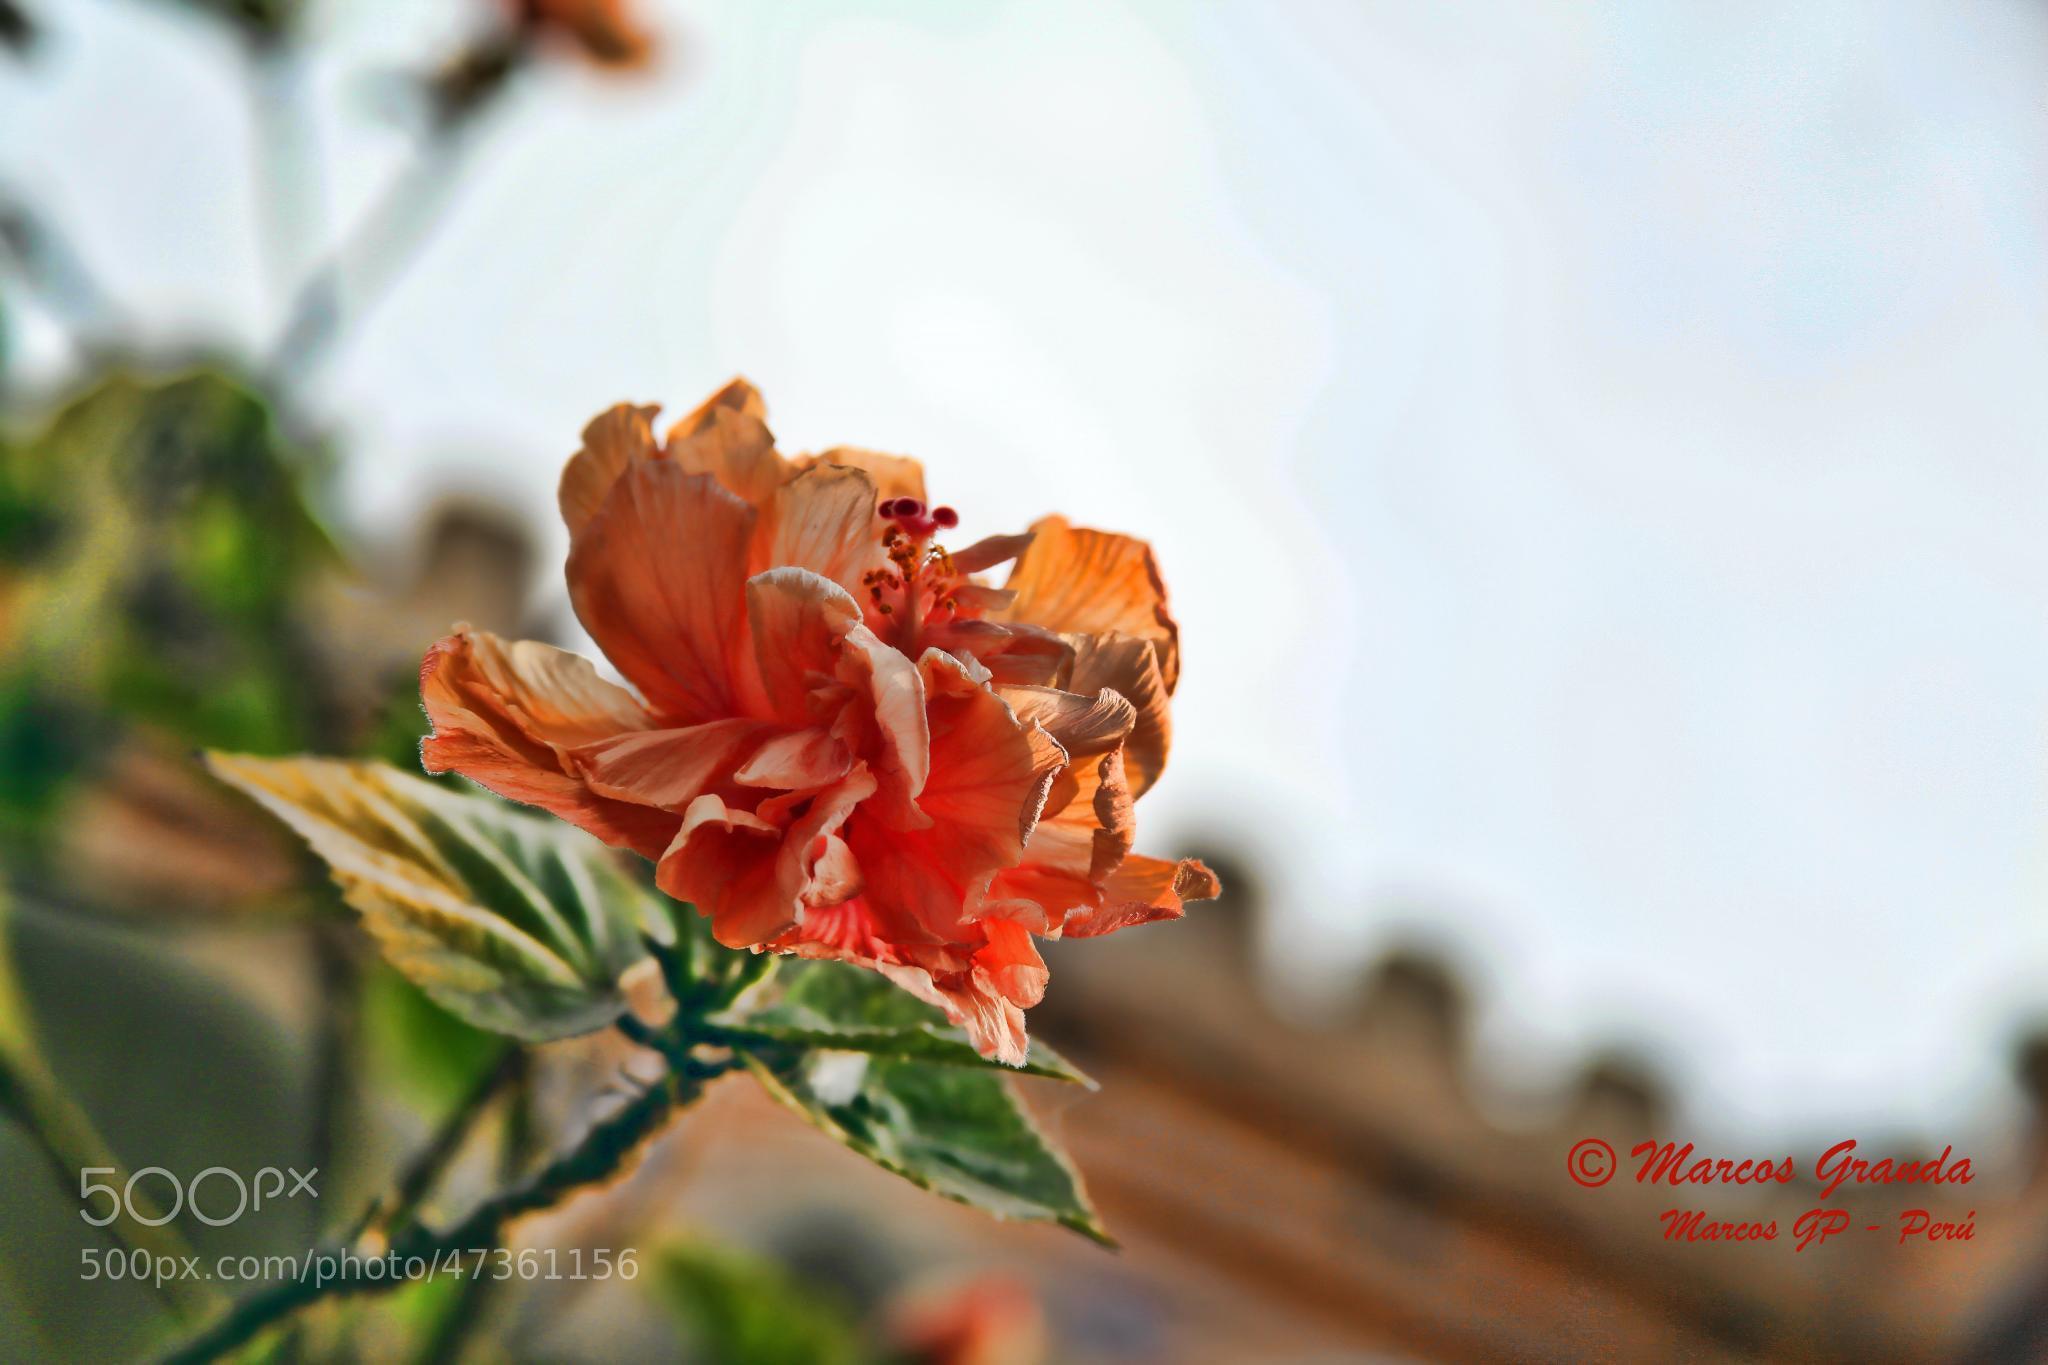 Photograph Flor en alza by Marcos  Granda P. on 500px